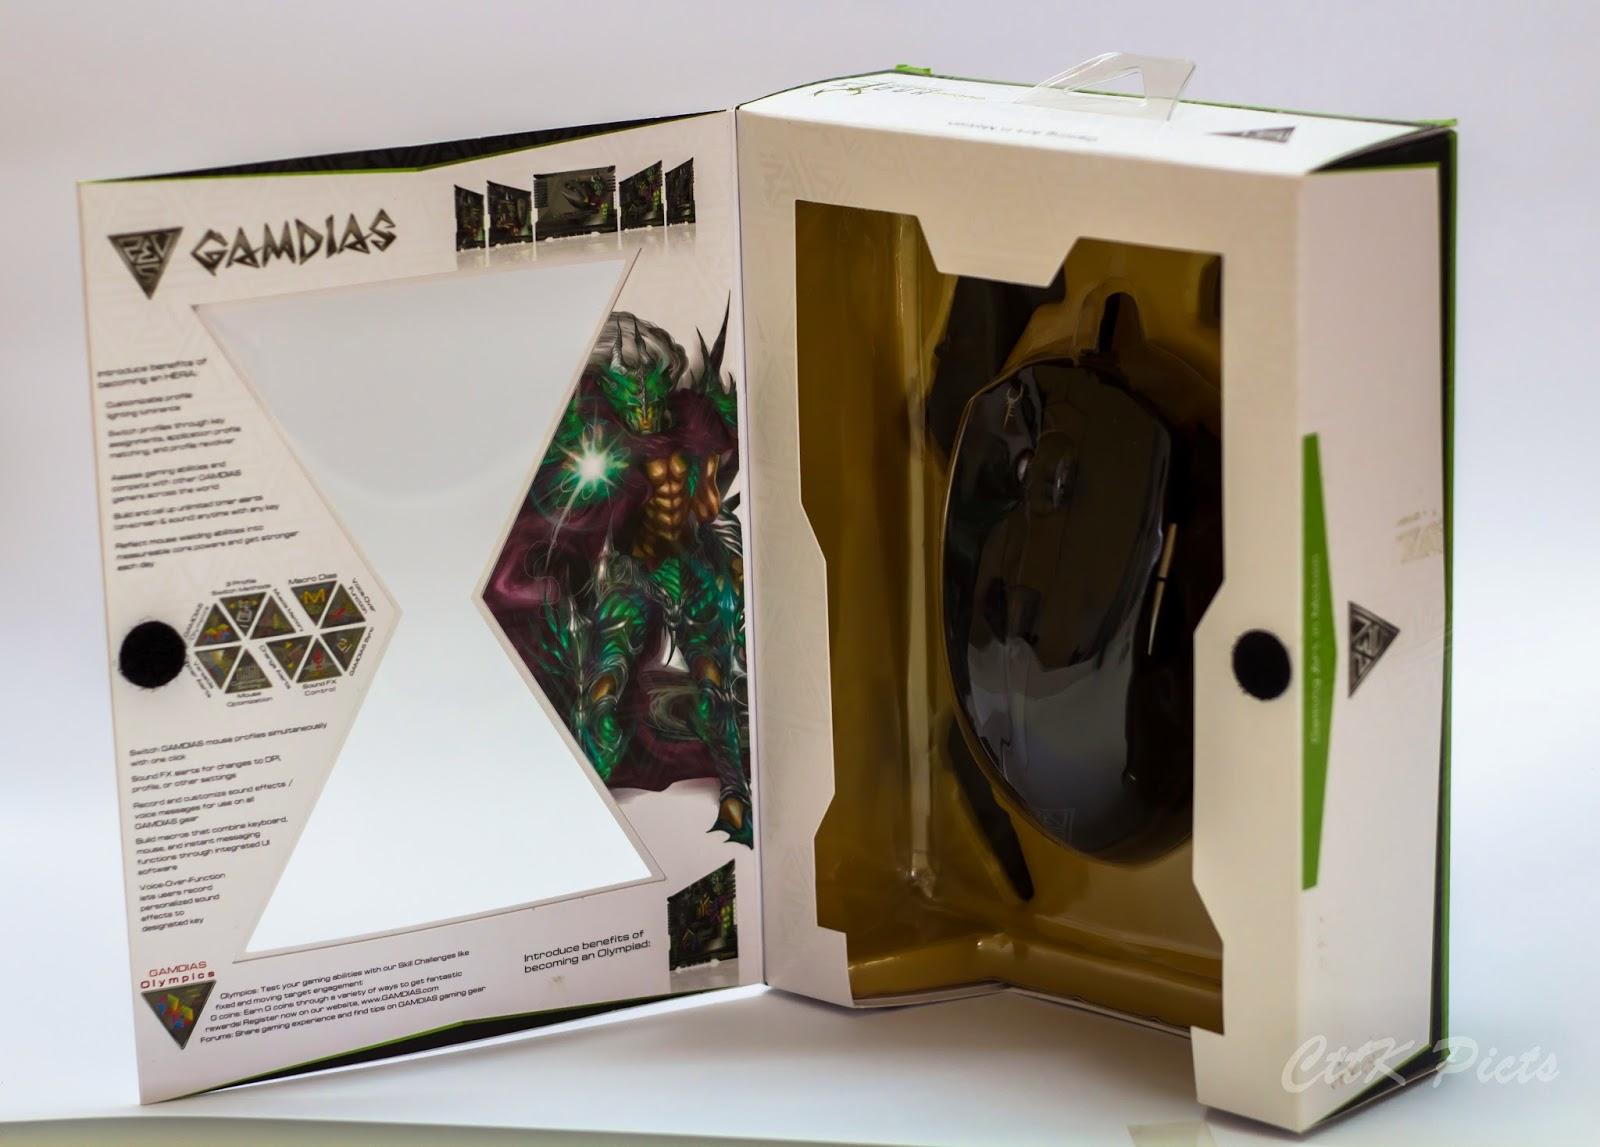 Gamdias Hades Extension Optical Gaming Mouse 56